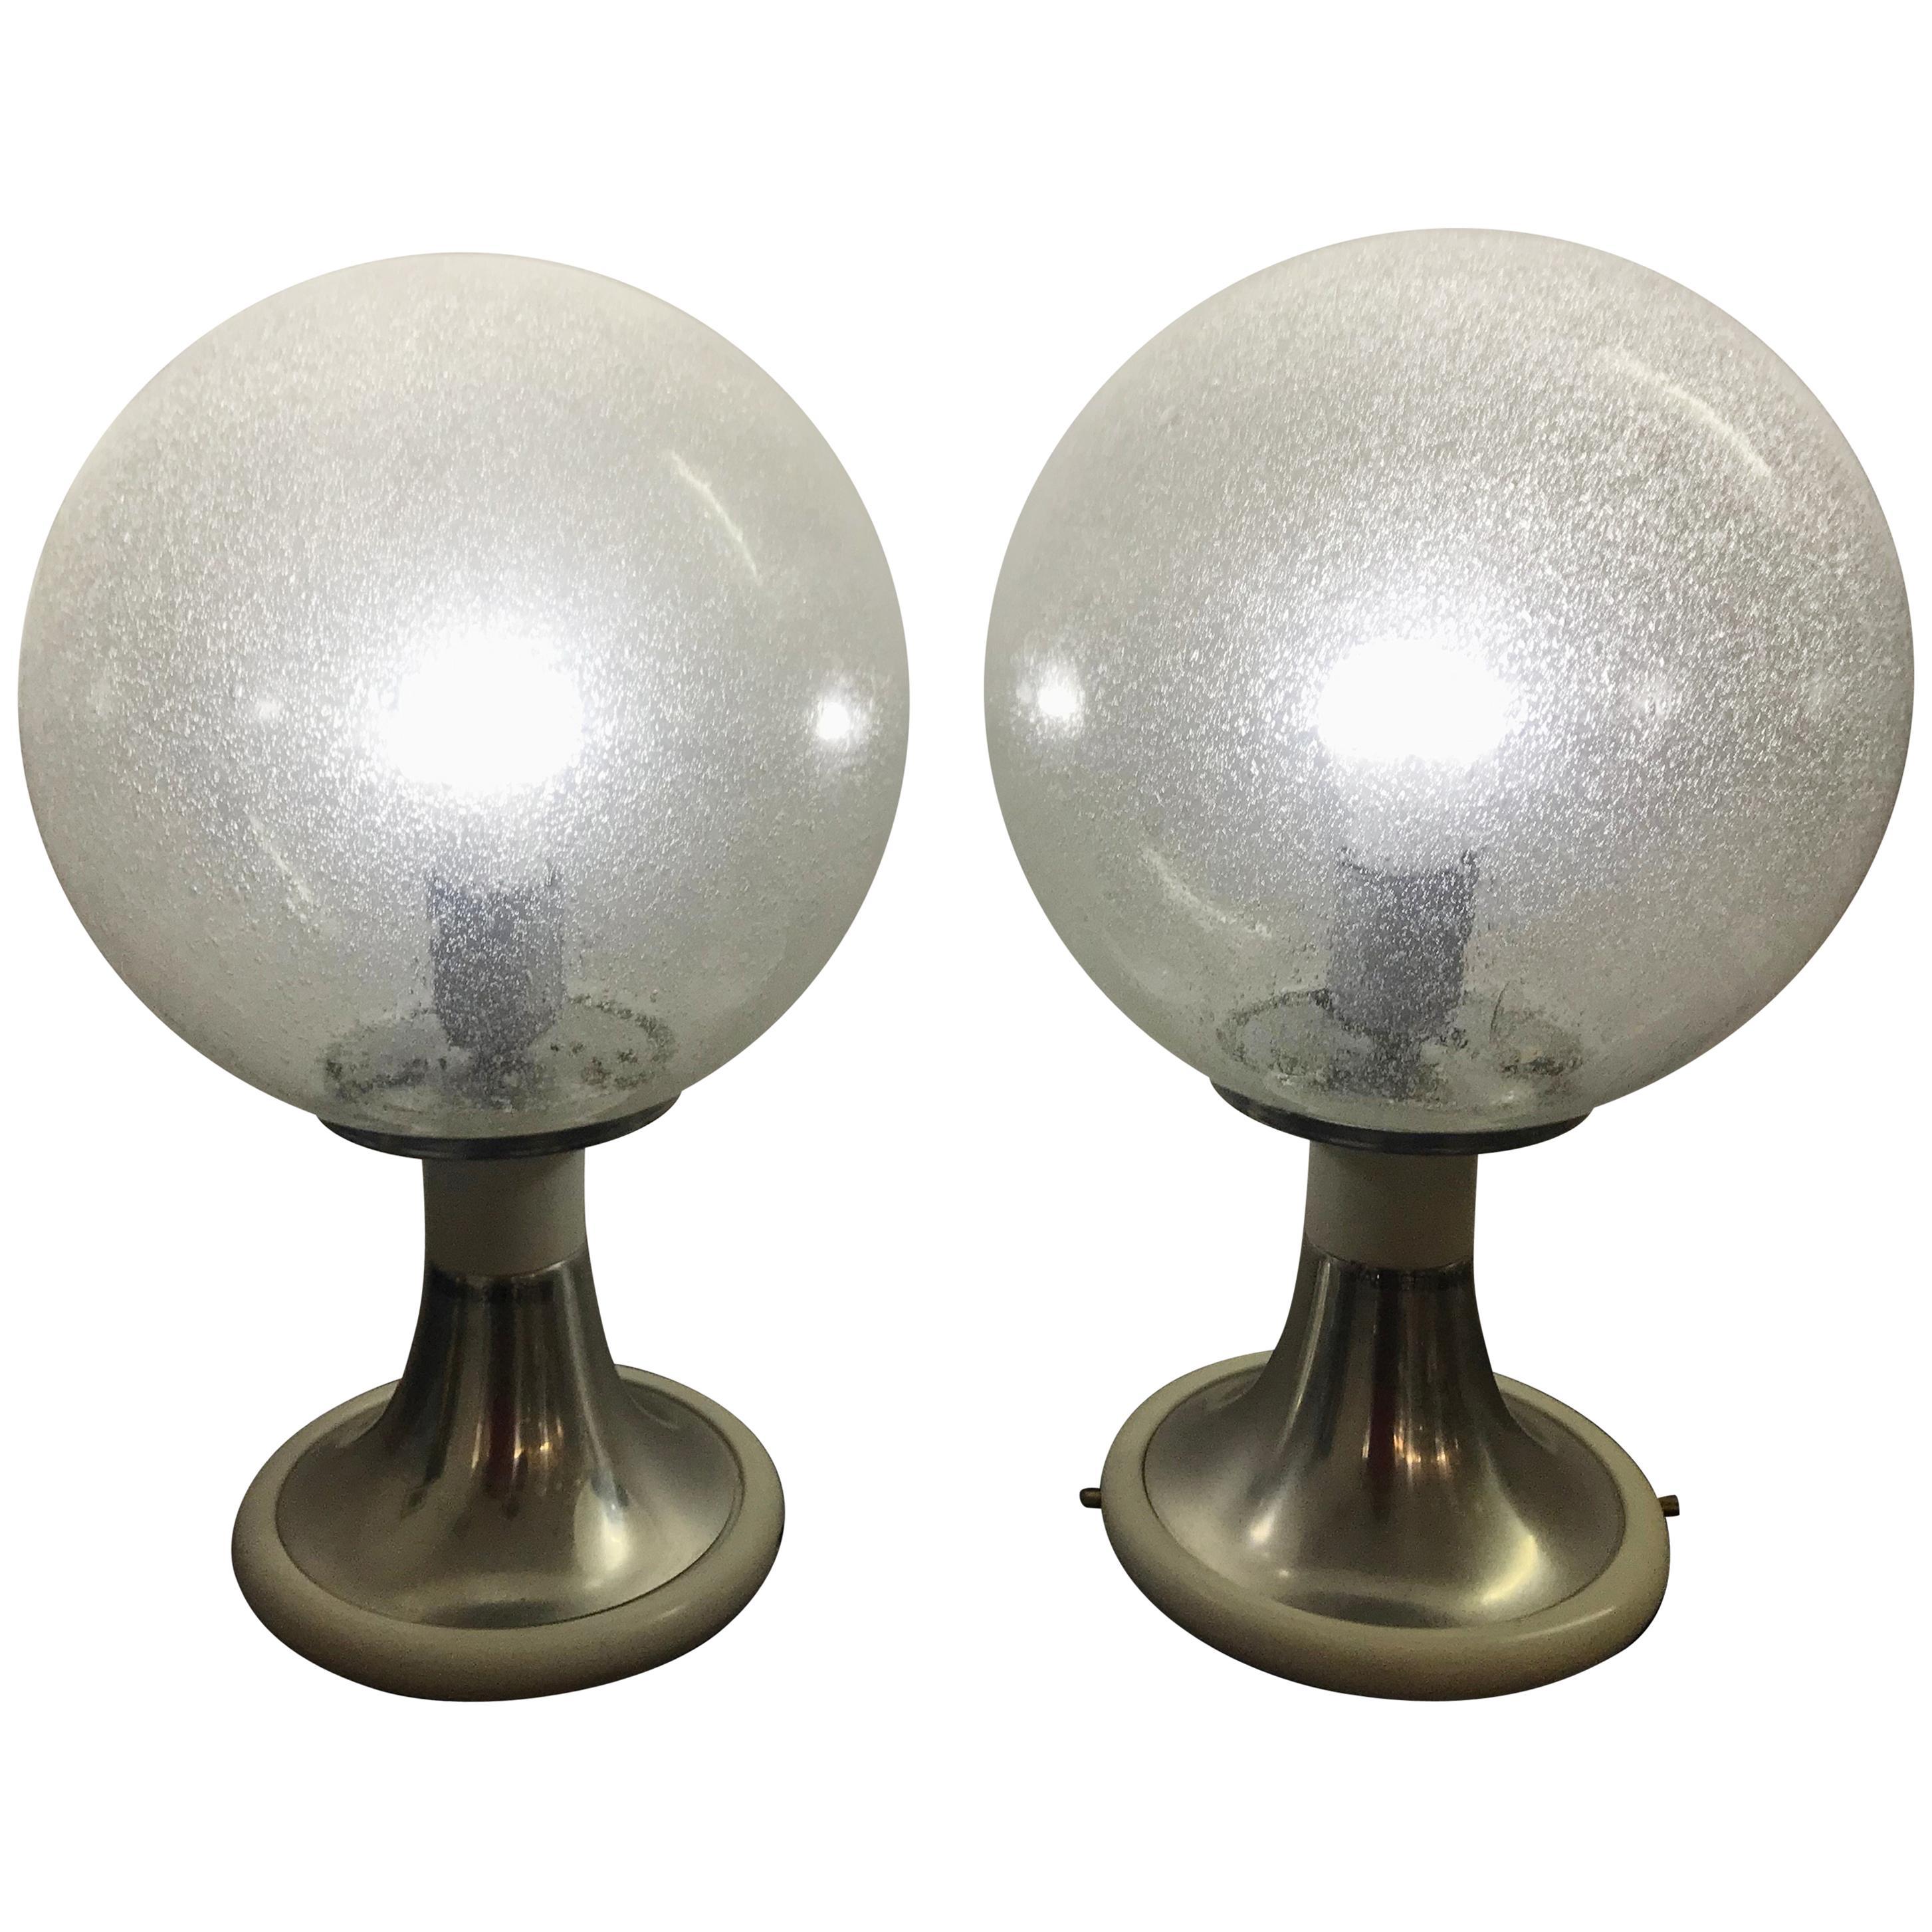 Mid-Century Modern Pair of Targetti Sankey Flush Mounts or Table Lamps